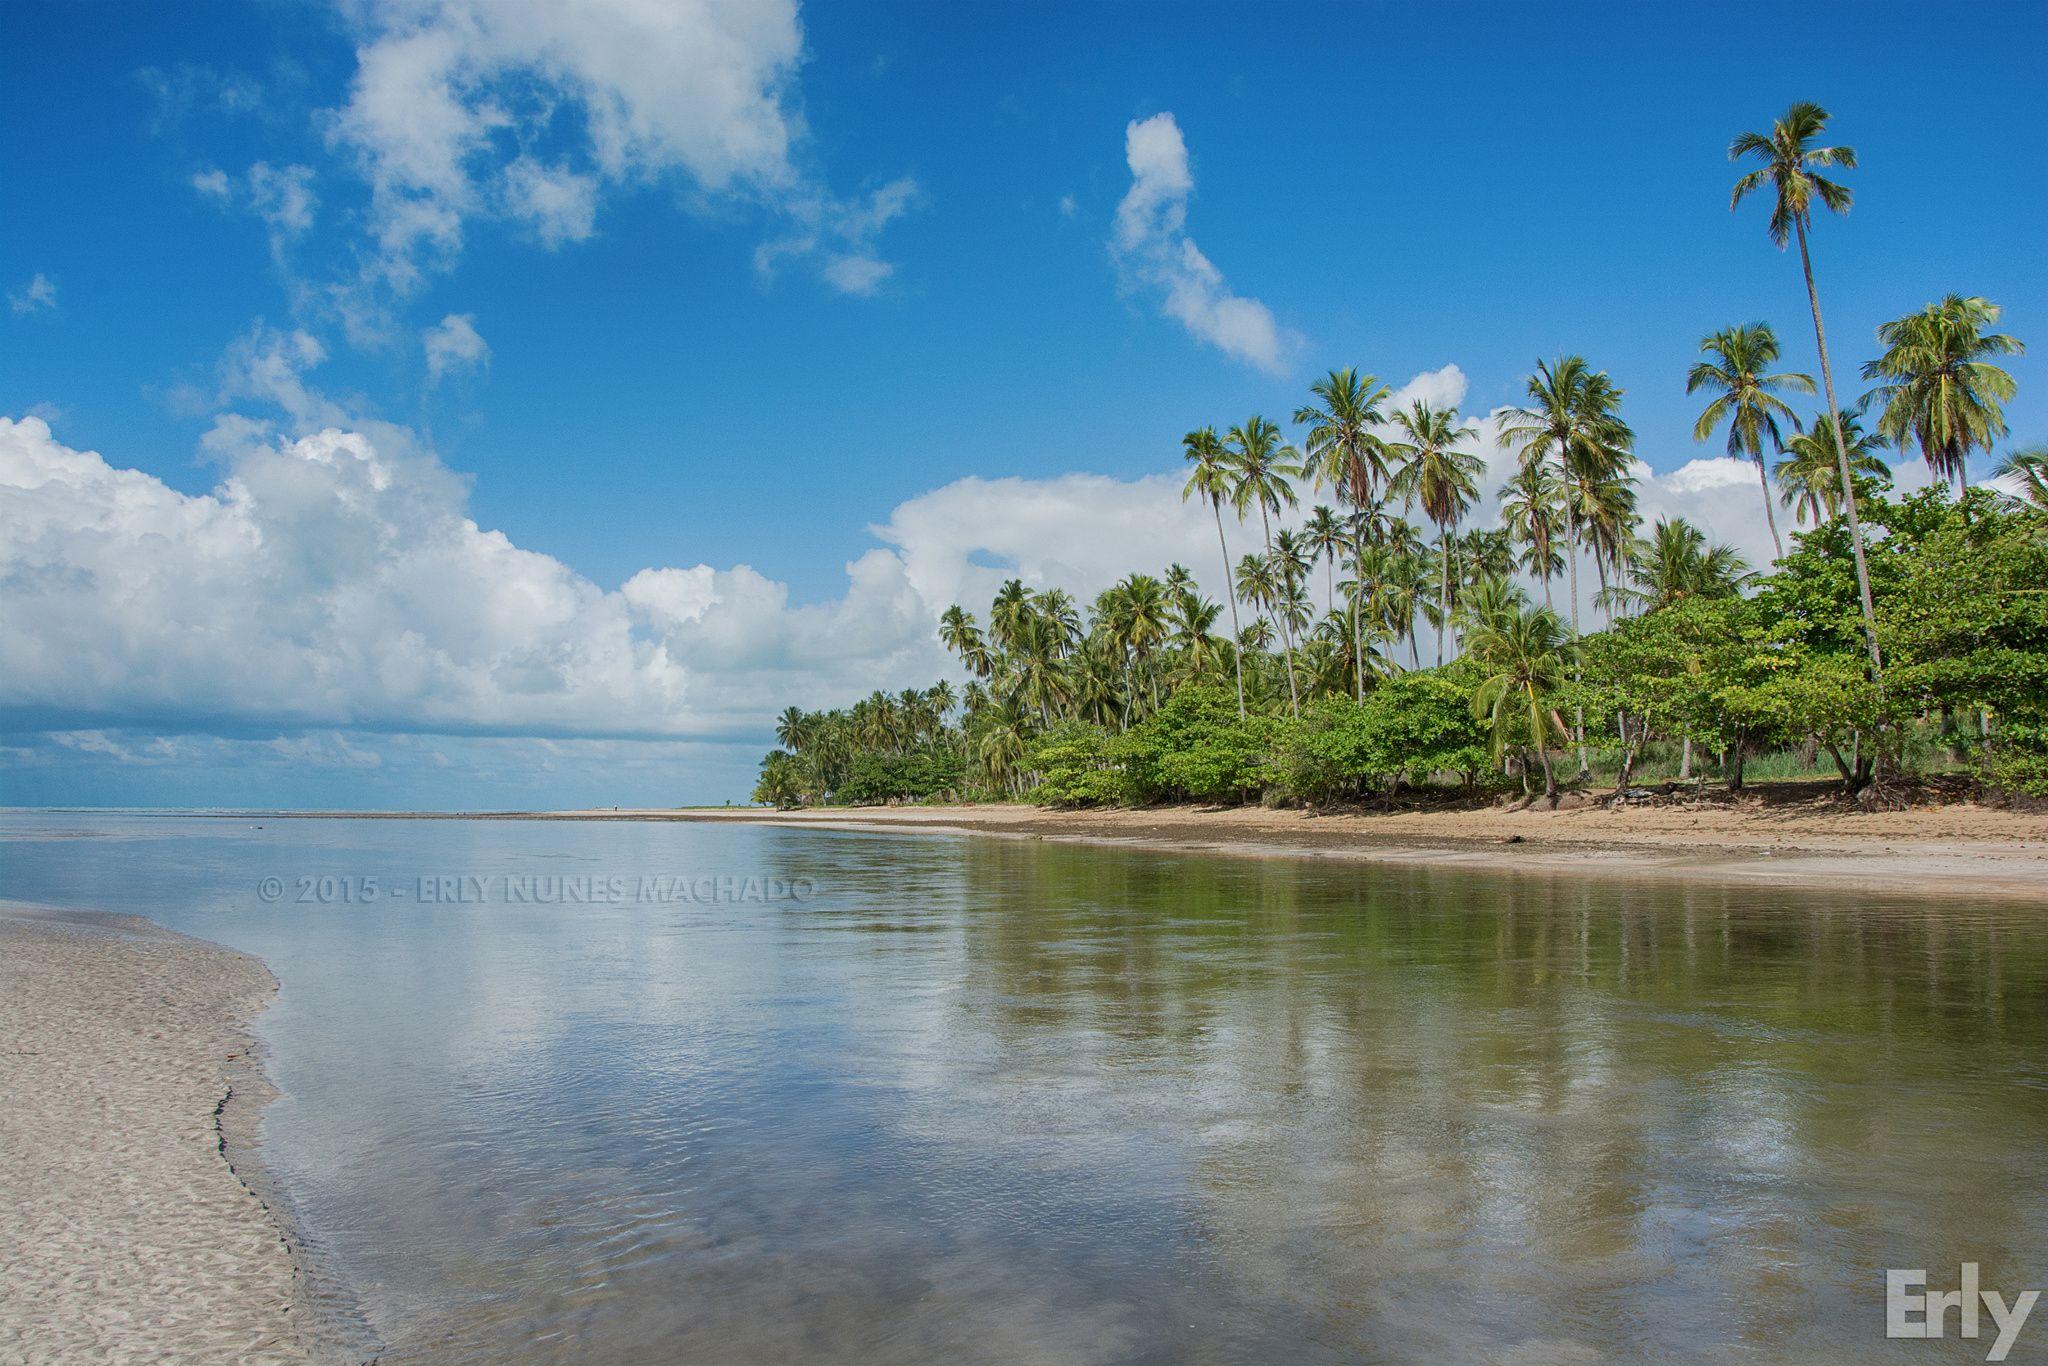 Maragogi - Alagoas by Erly Nunes Machado on 500px